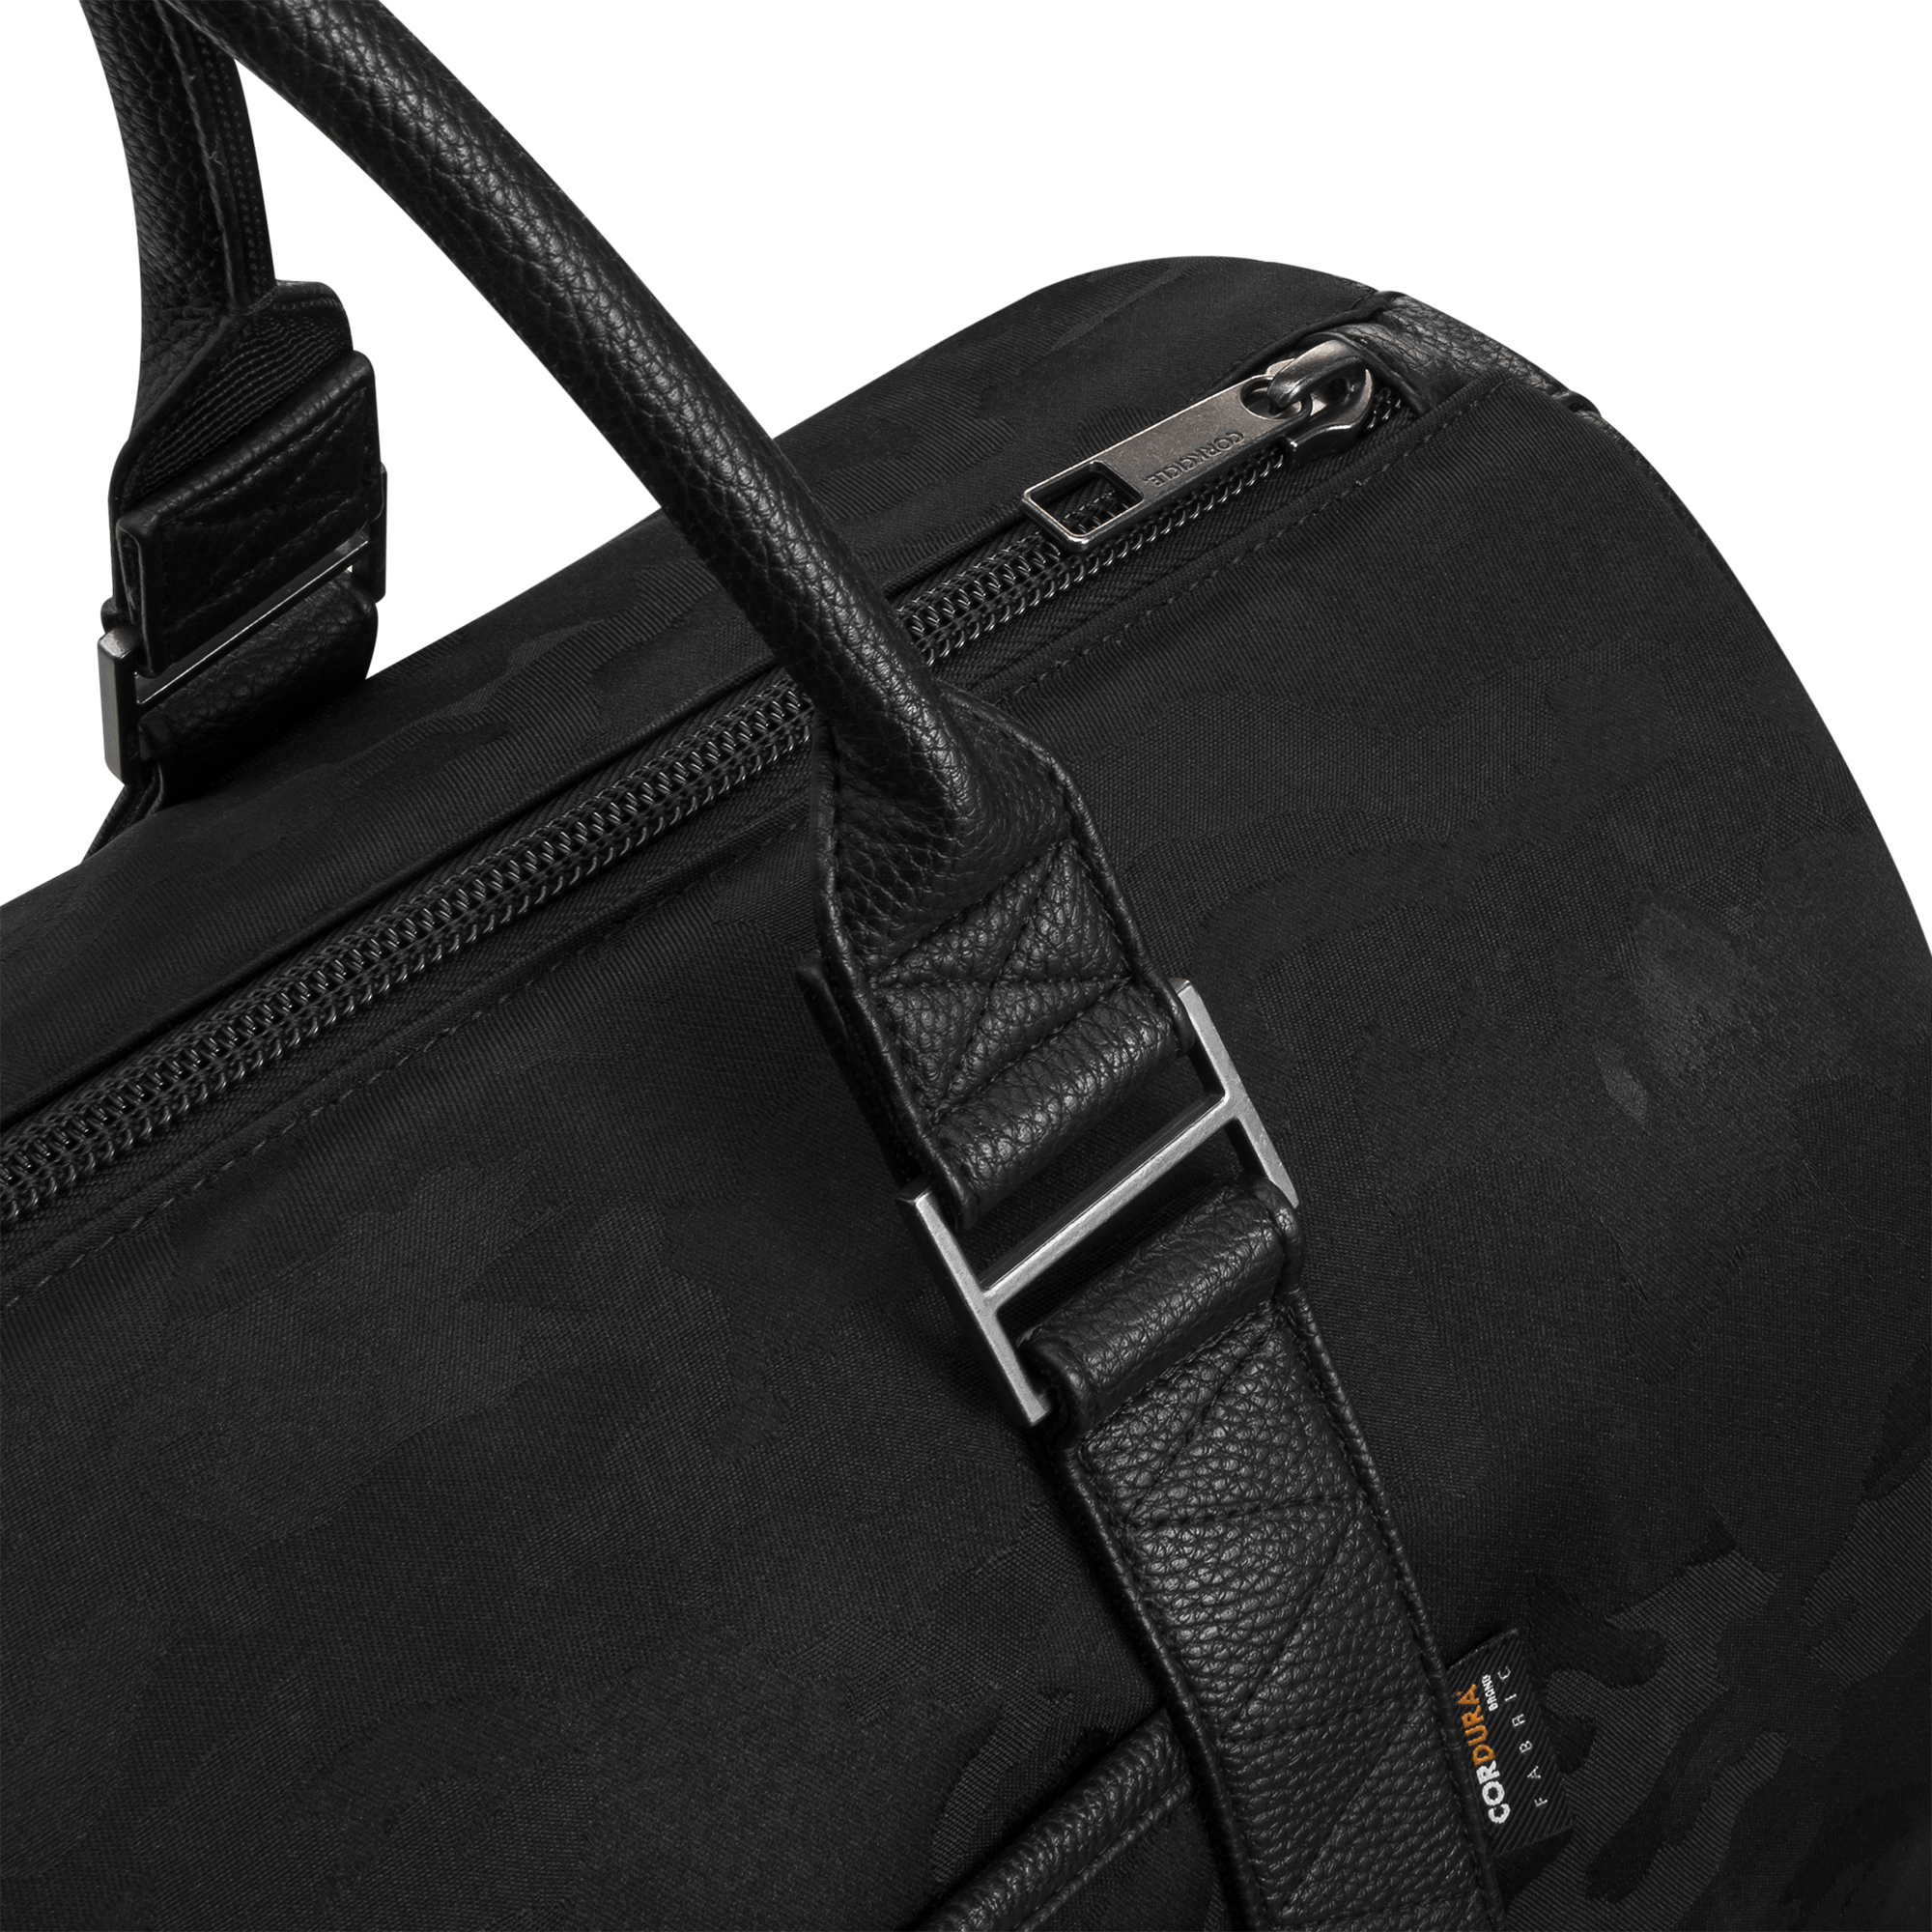 black bag product image